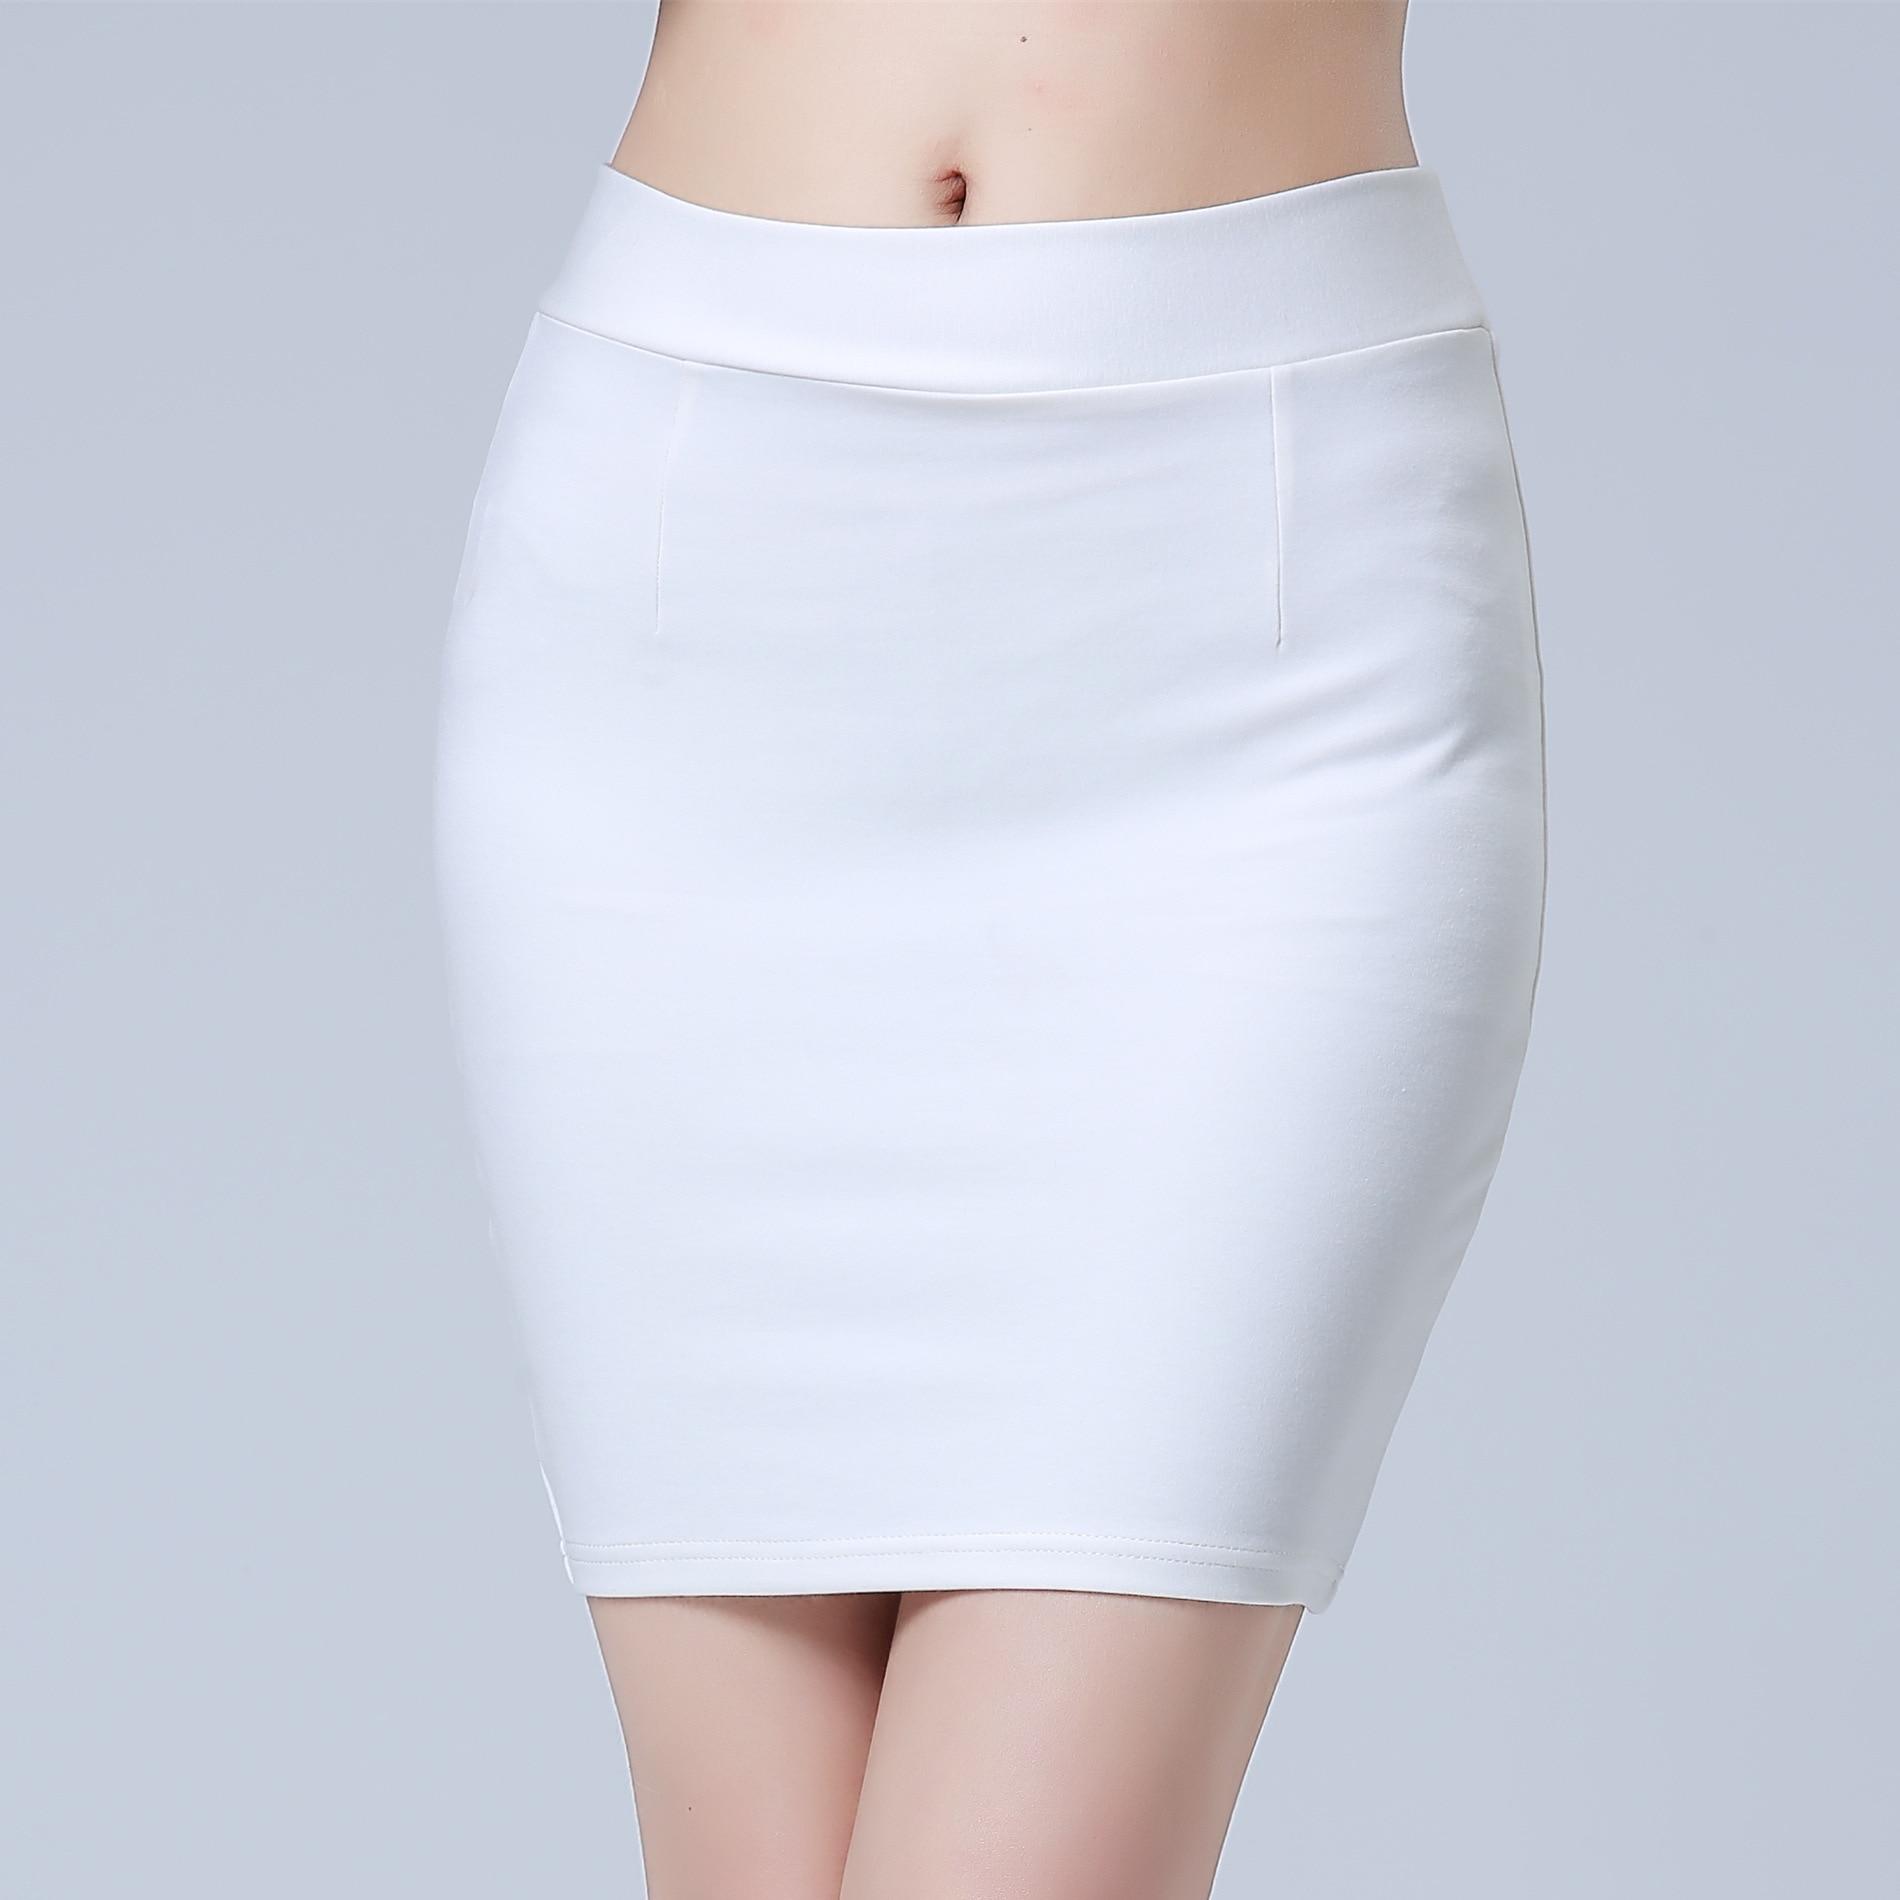 MSAISSSummer Lady Mini font b Bag b font Hip Skirt Professional Female Office Style Skirt